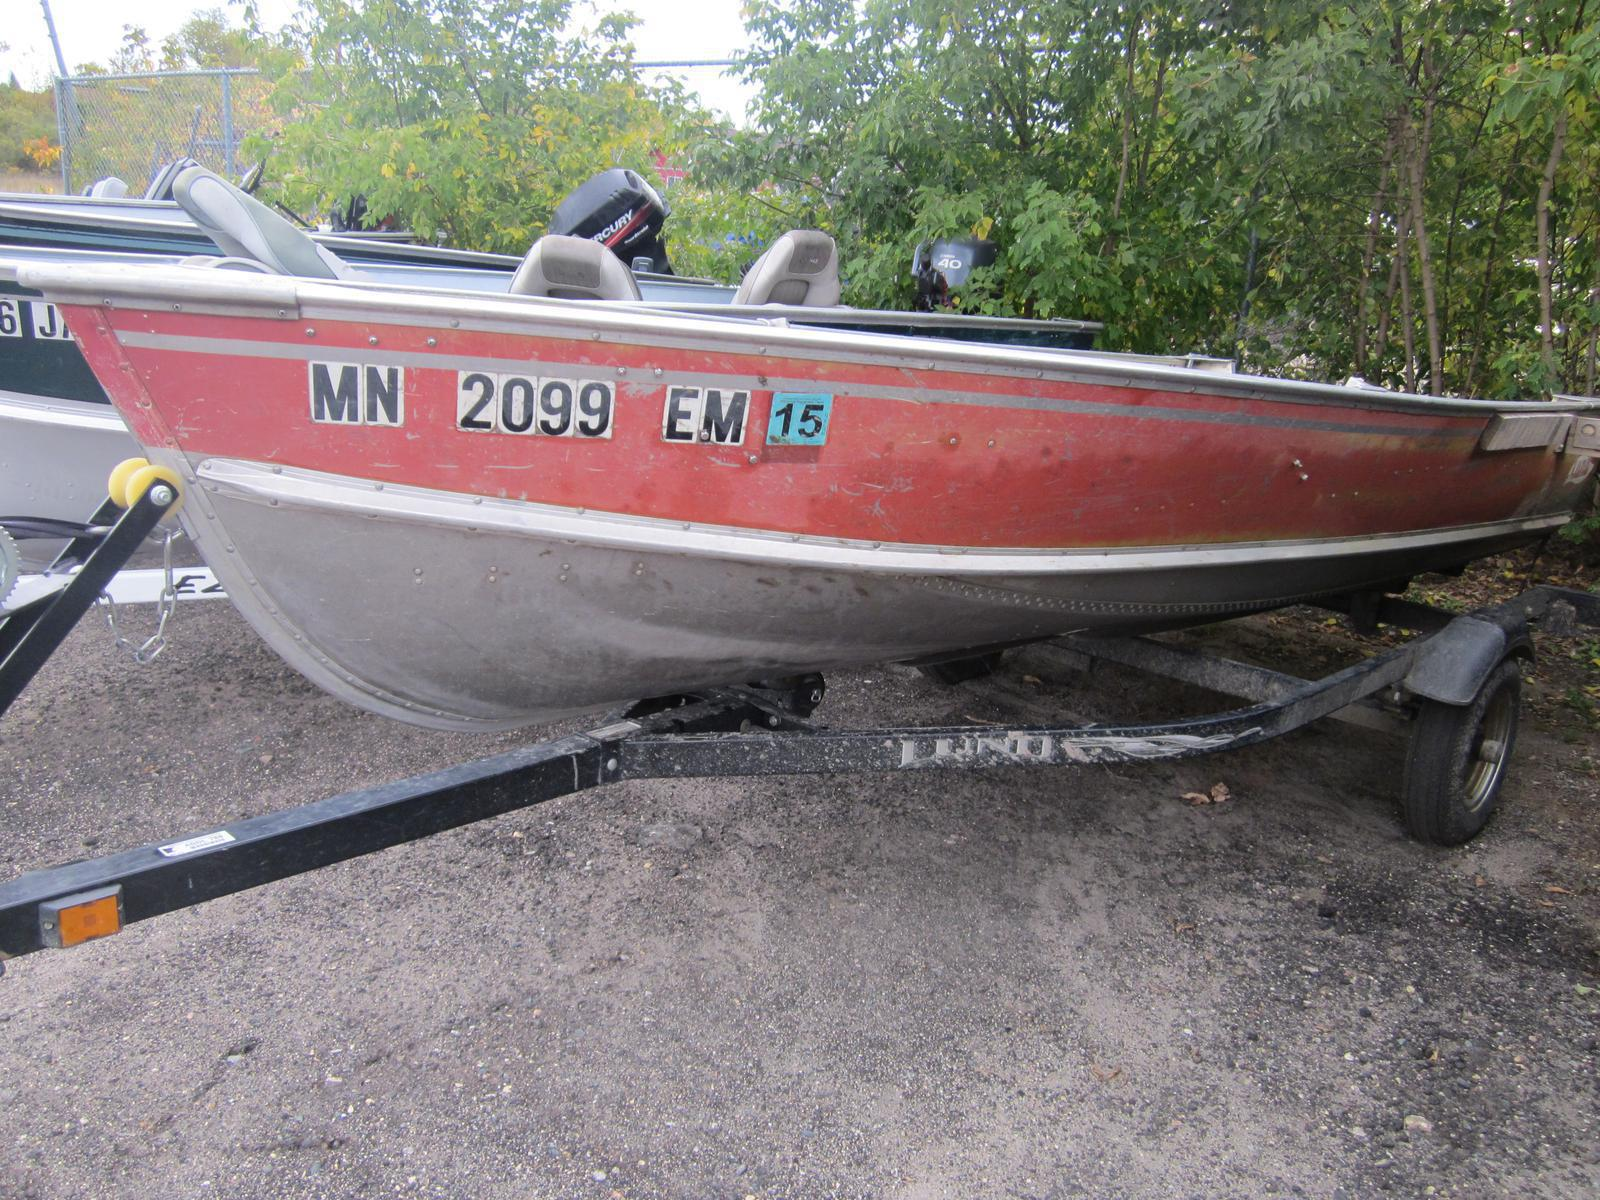 Inventory Ray's Sport & Marine Bemidji, MN (888) 647-8238